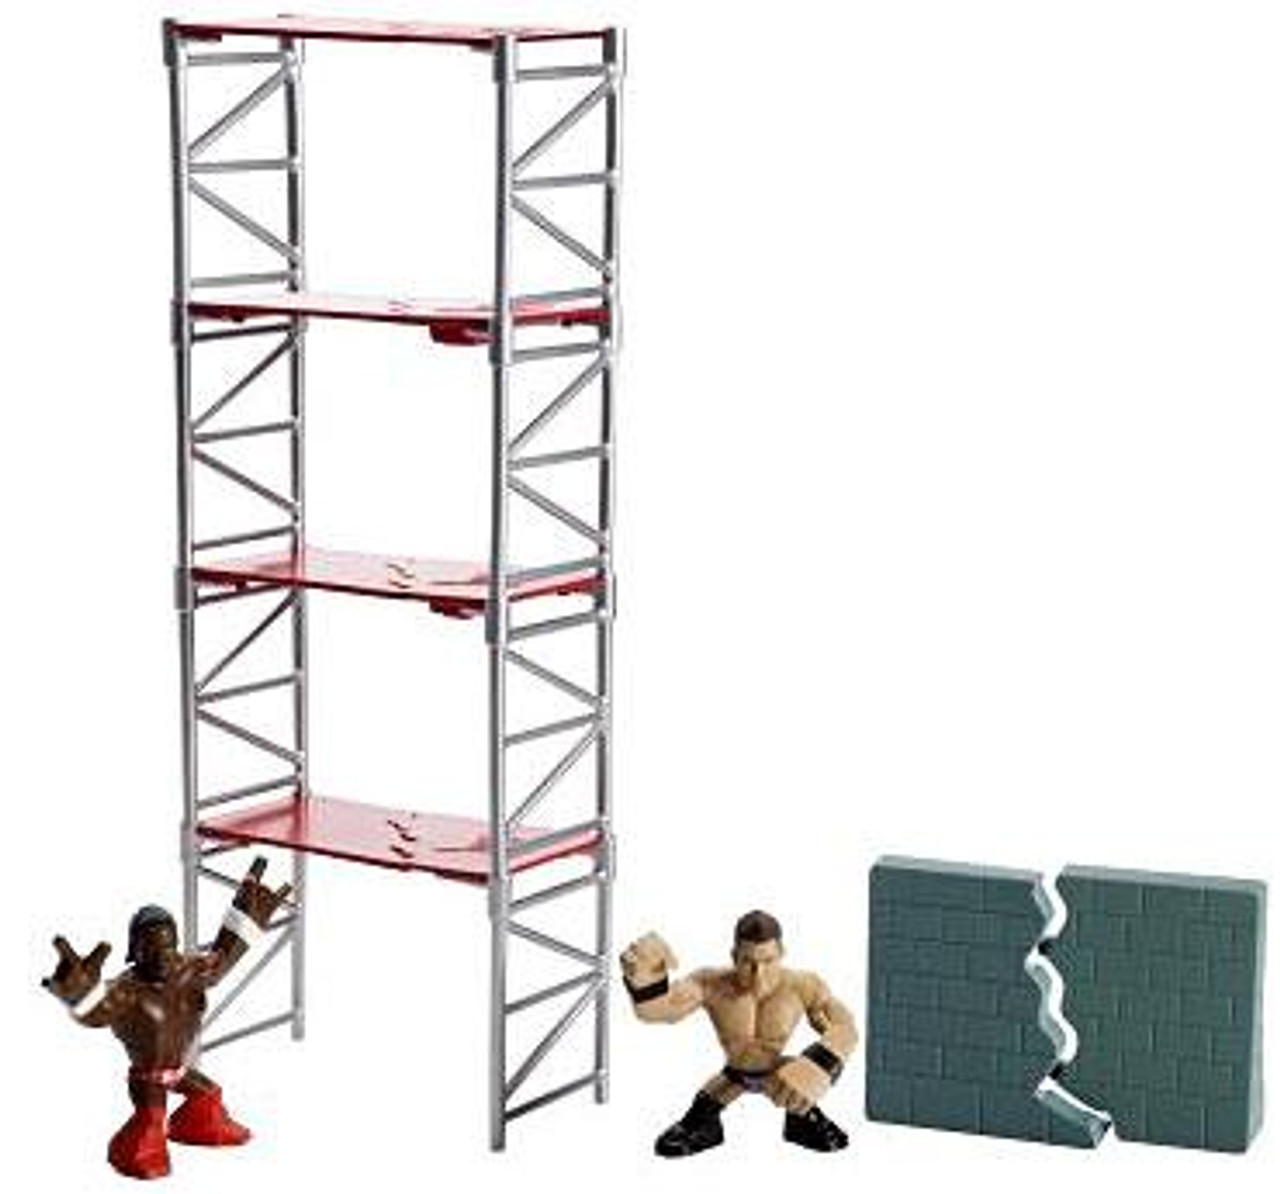 WWE Wrestling Rumblers Rampage Scaffold Smash Mini Figure Playset